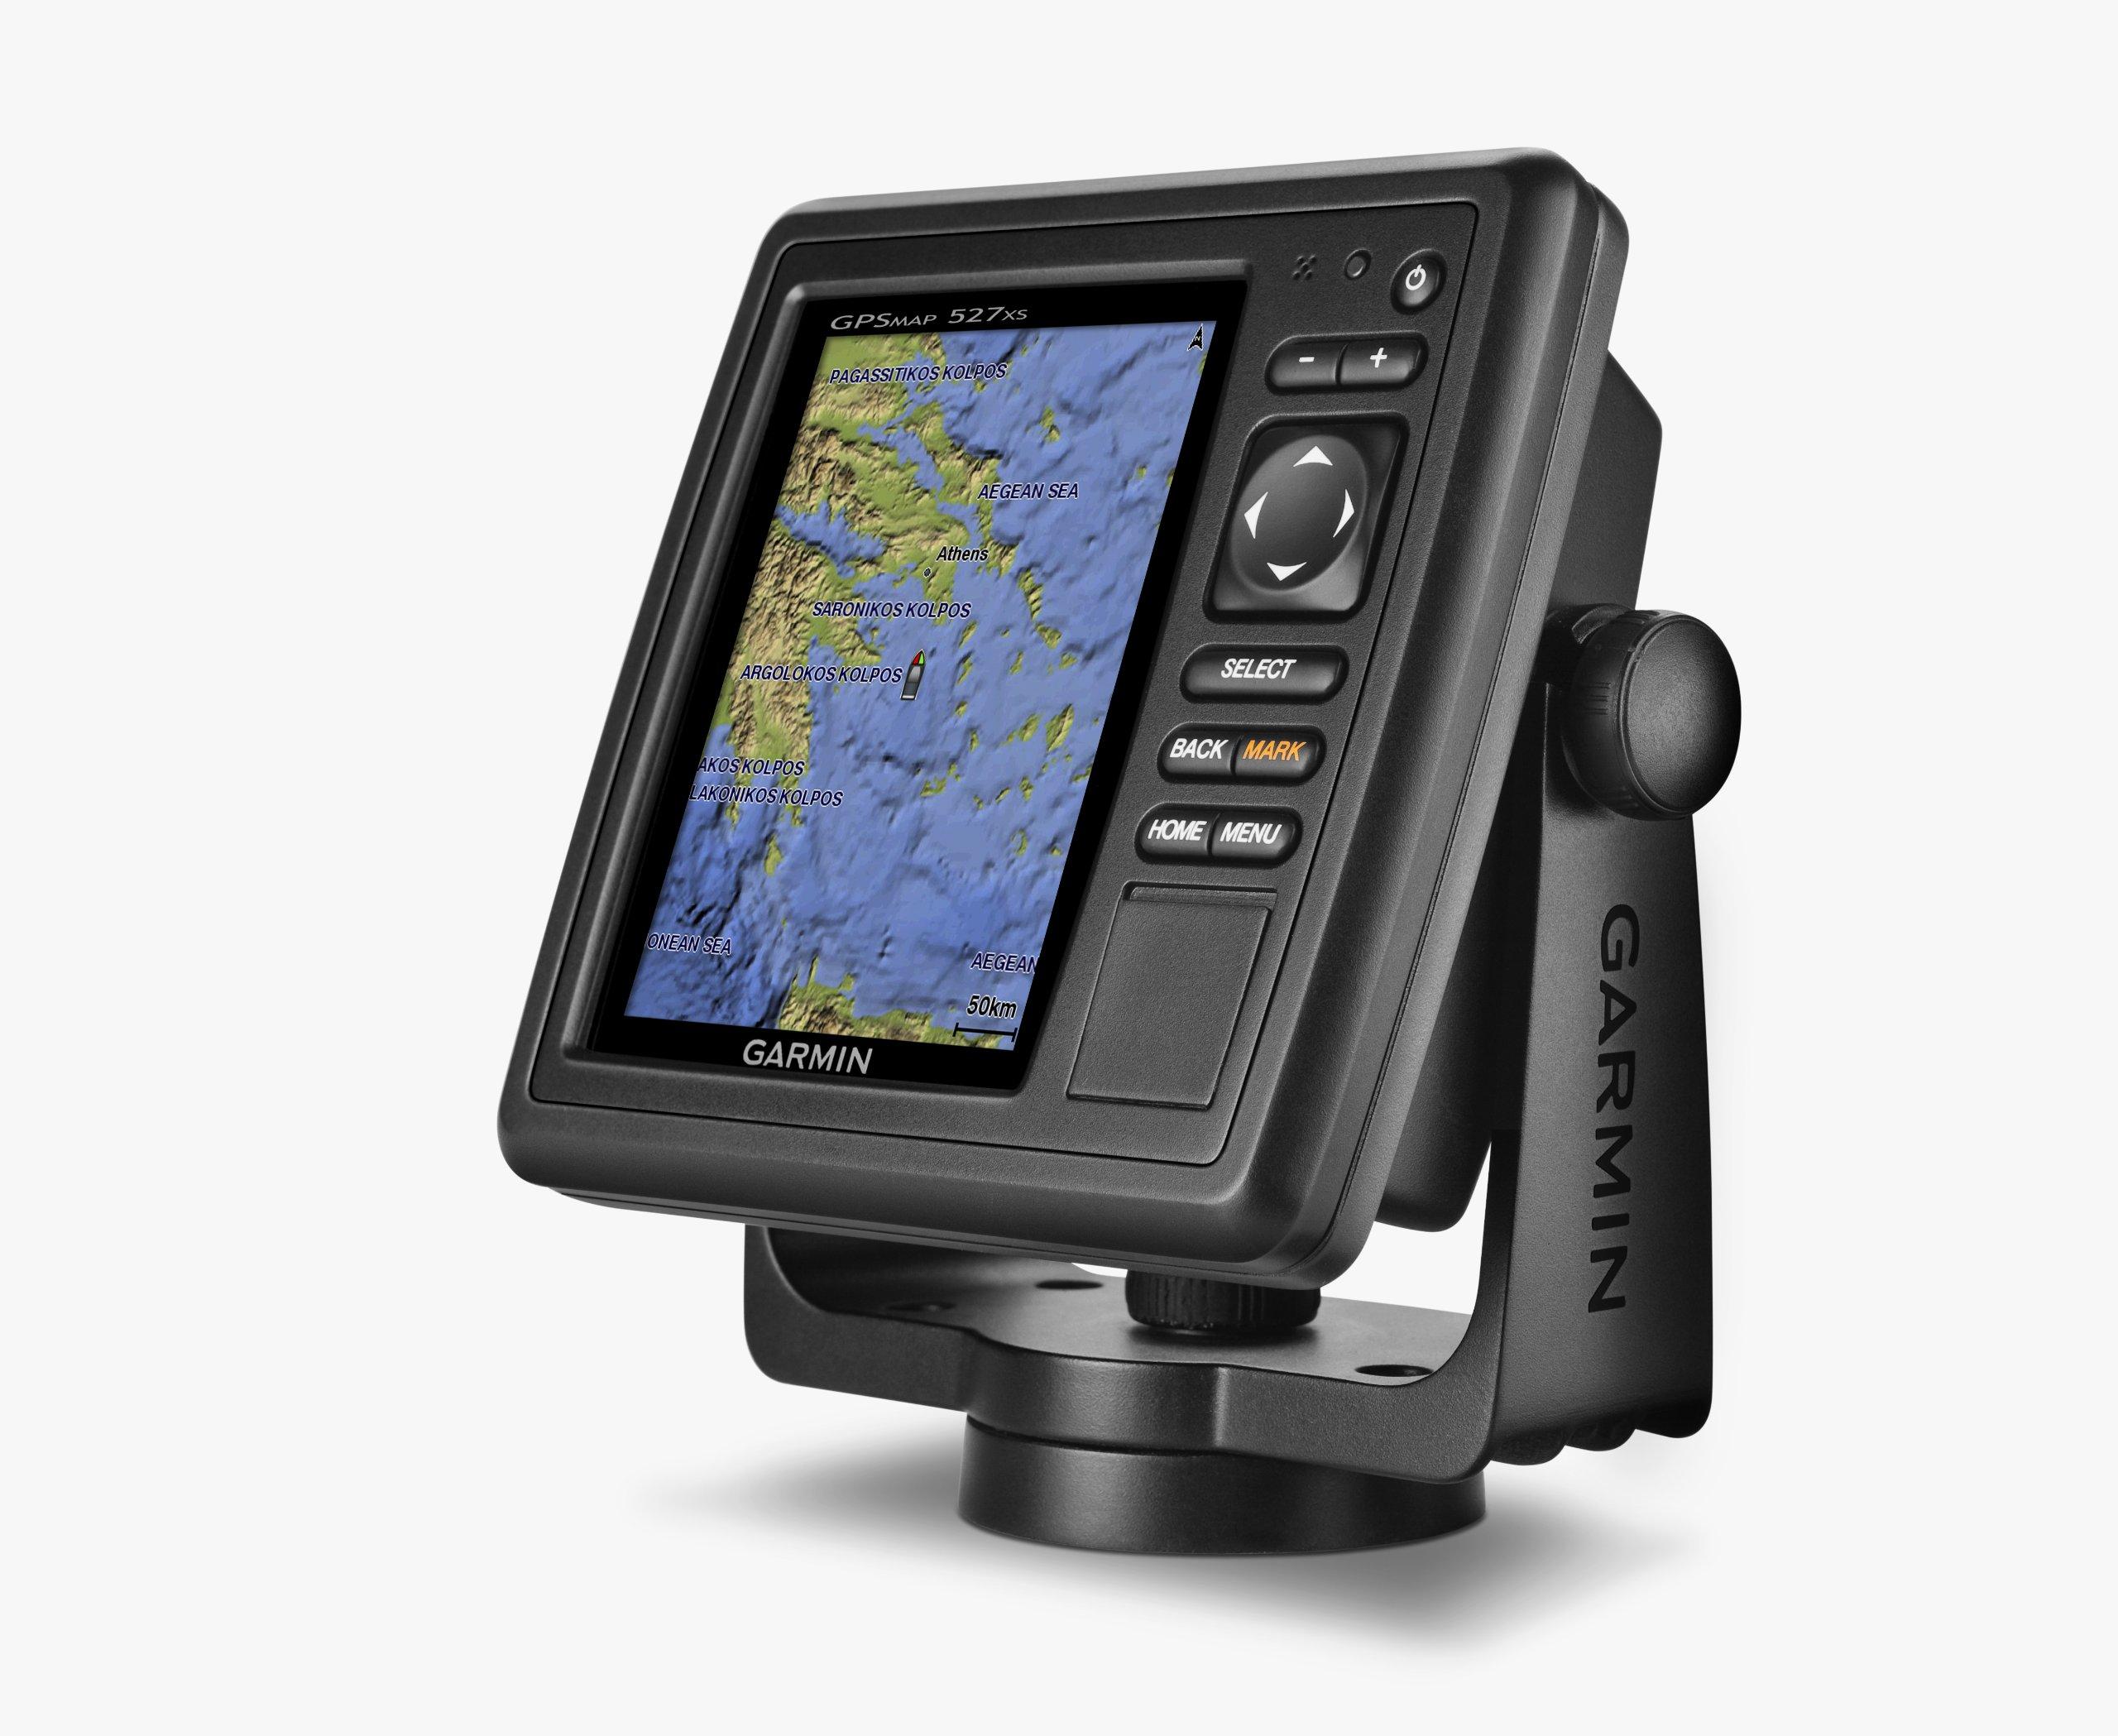 Garmin 010-01092-02 GPSMAP 527xs - Radar sin Aviso Trasero: Amazon.es: Electrónica